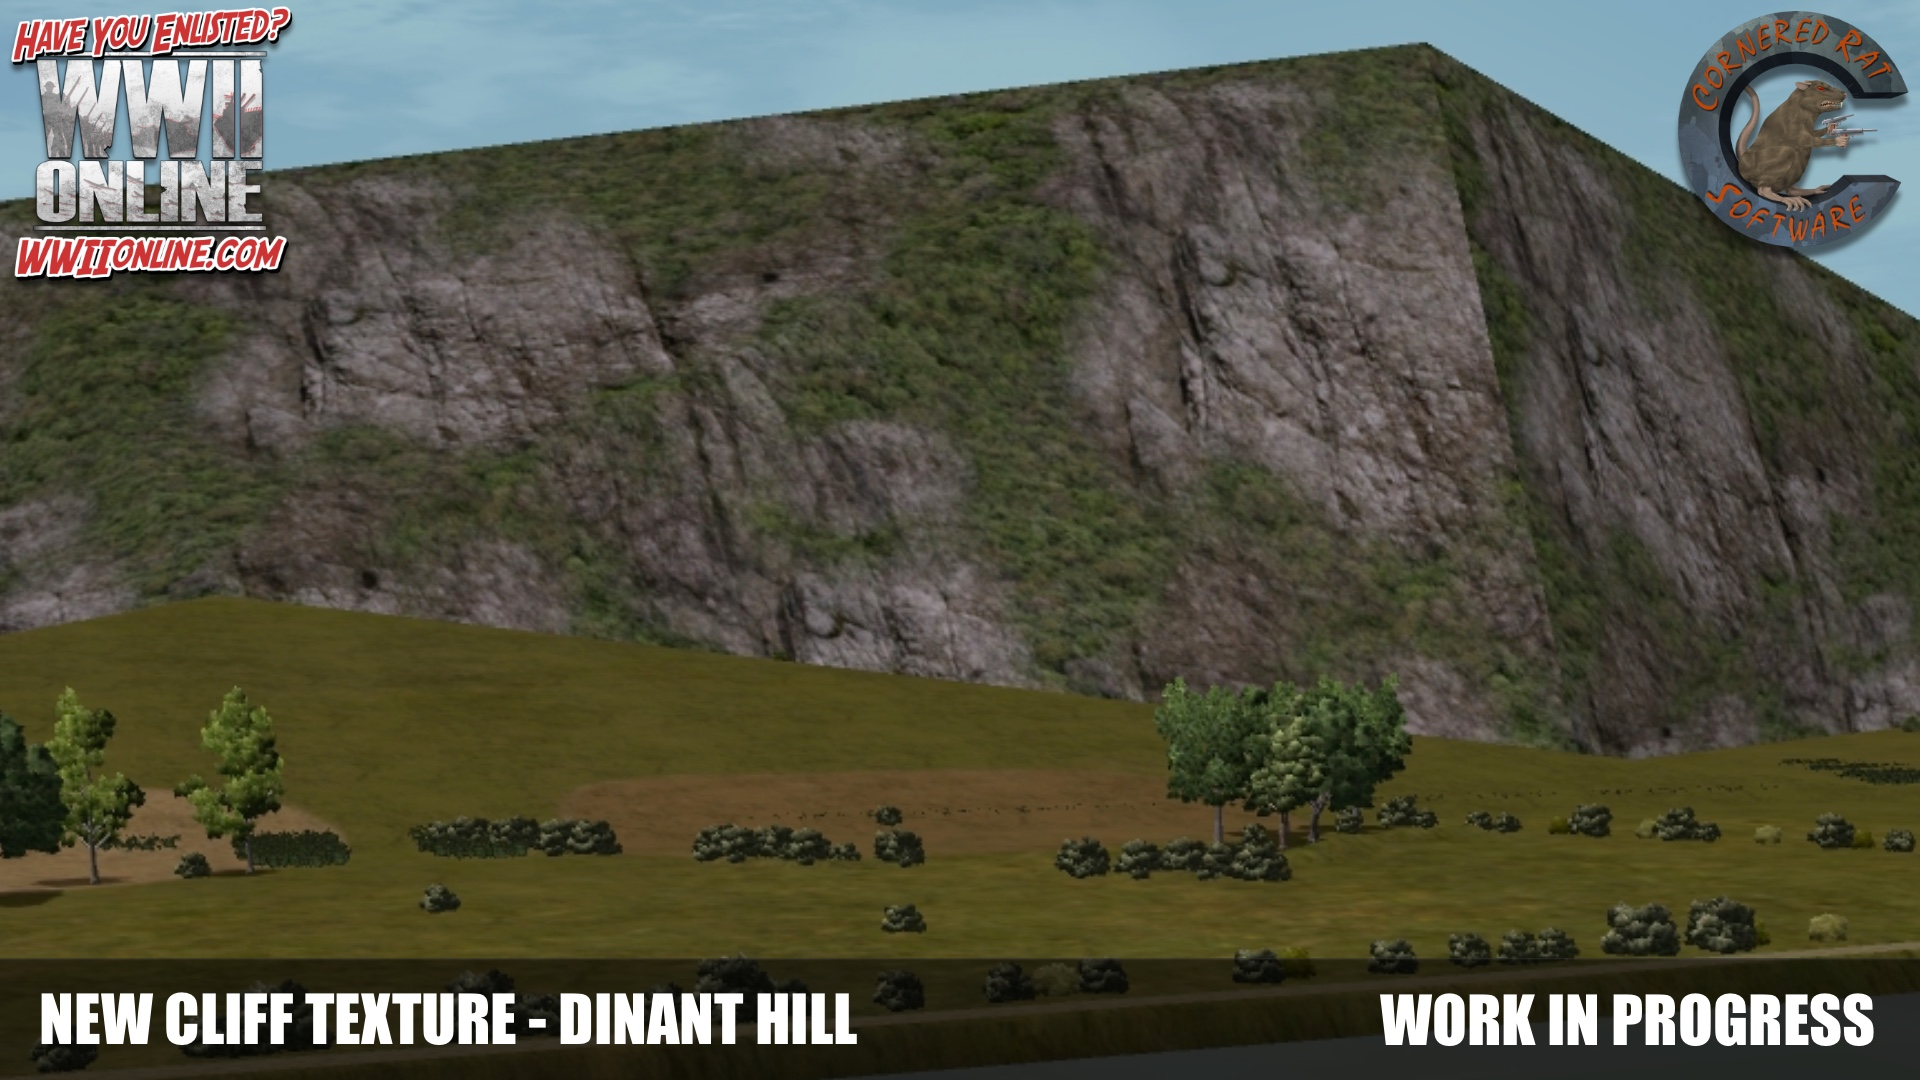 4 dinant hill